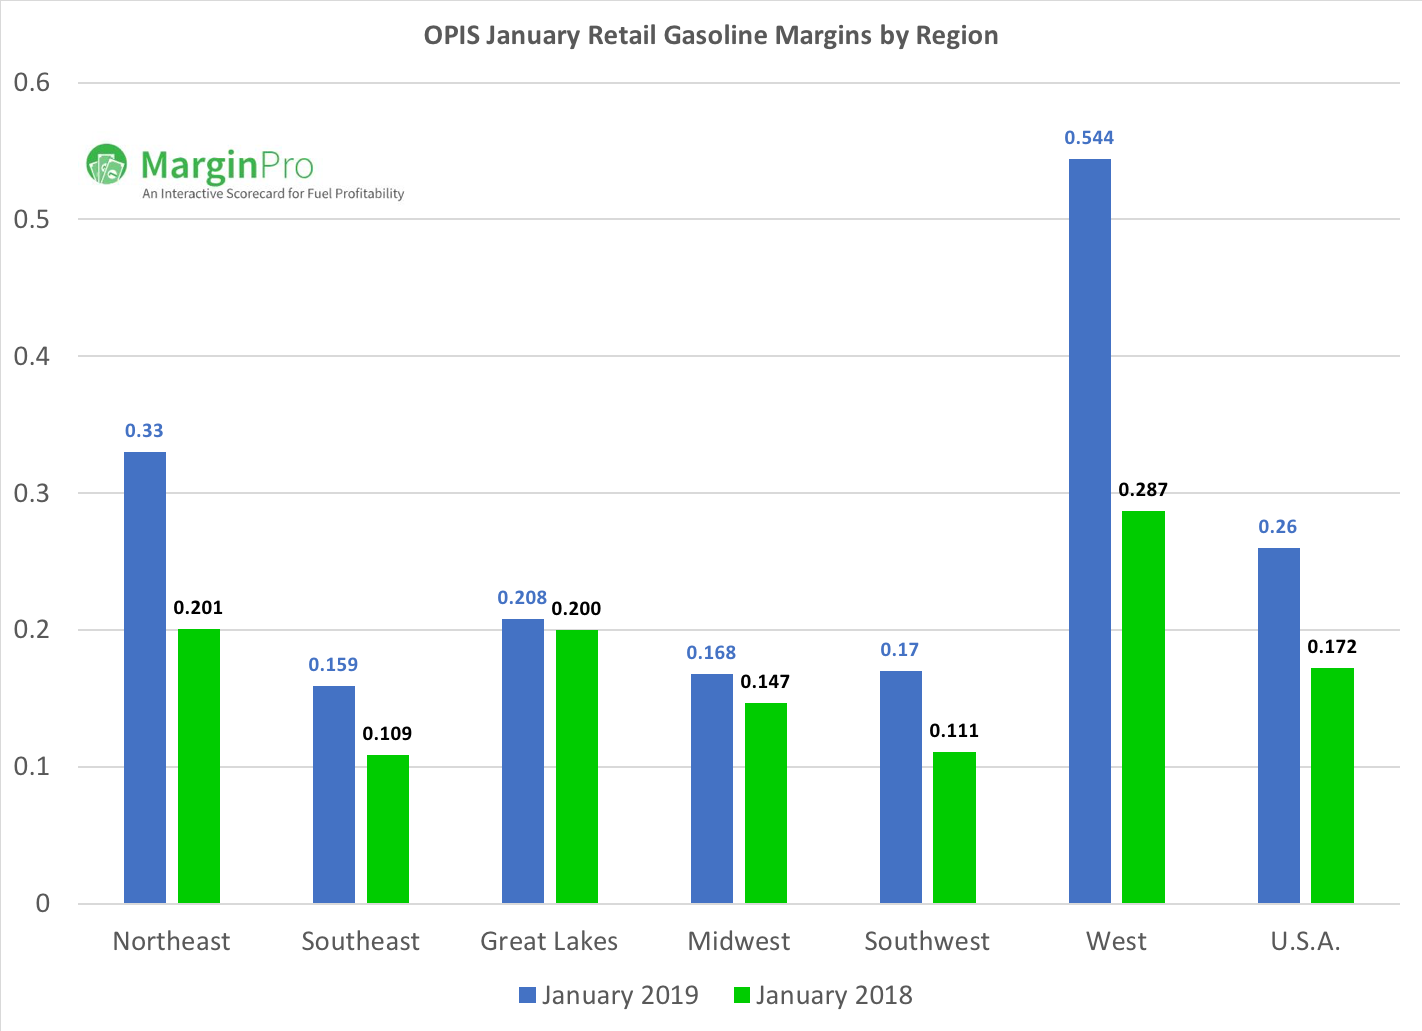 January 2019 Regional Gasoline Profits